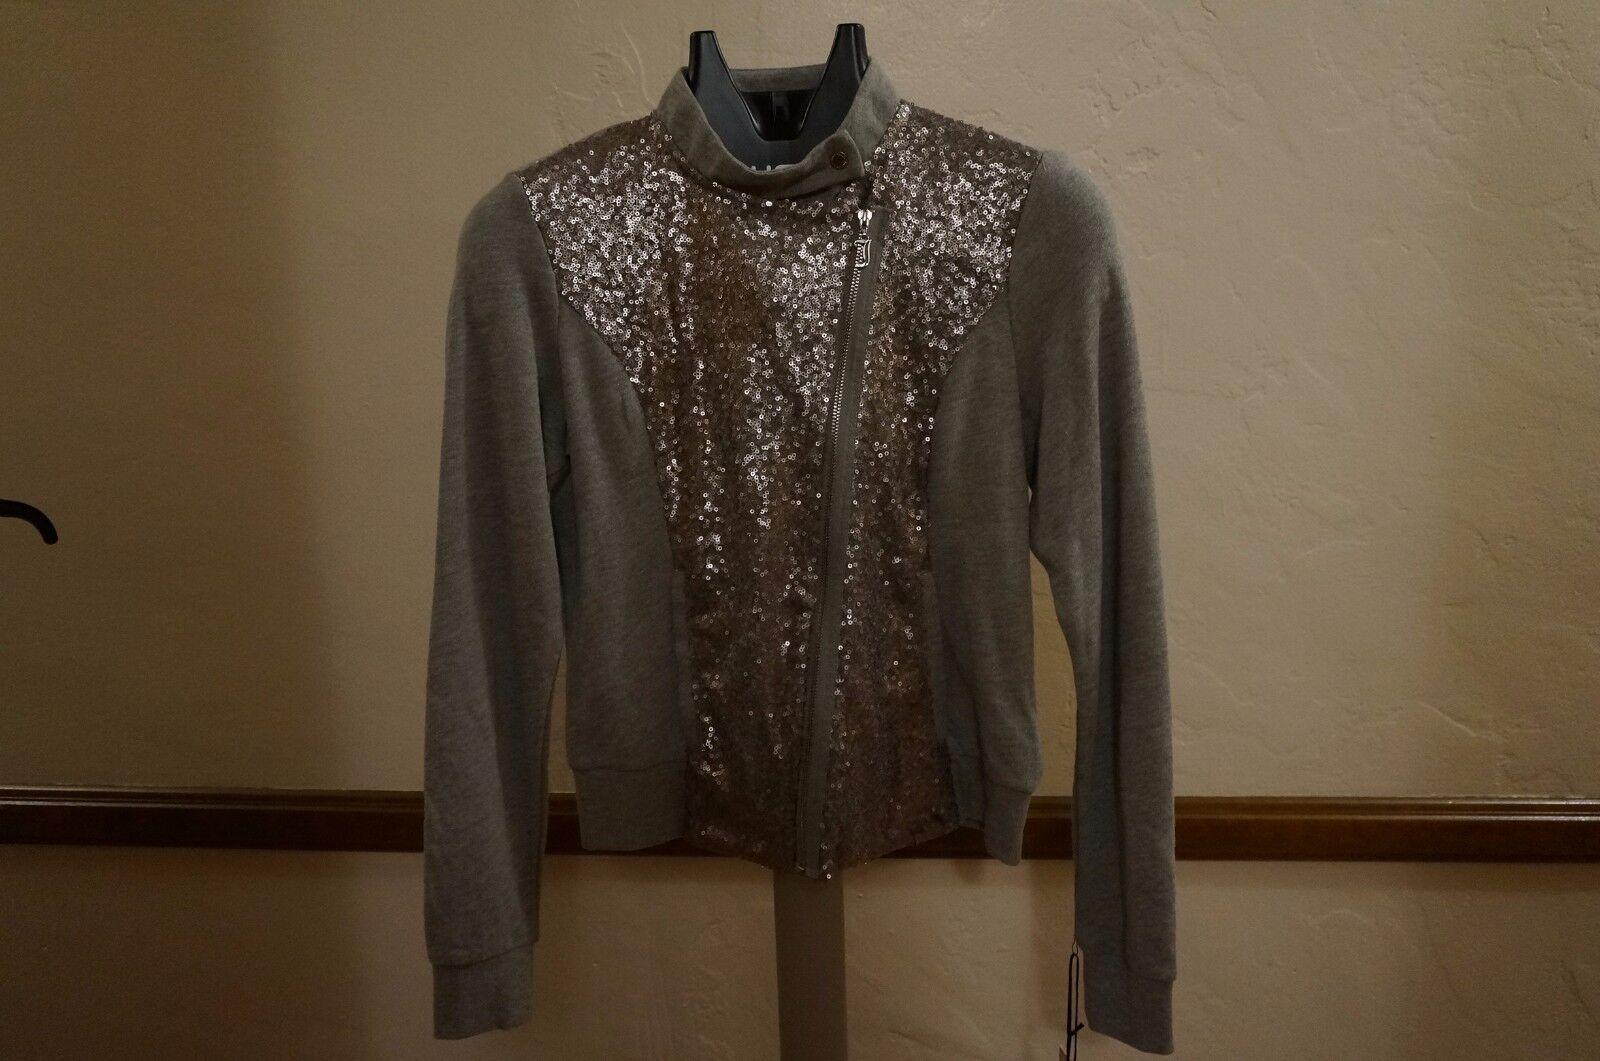 e2a305cc3 Juicy Couture Heather Gray Sequin Bomber Jacket Sz S